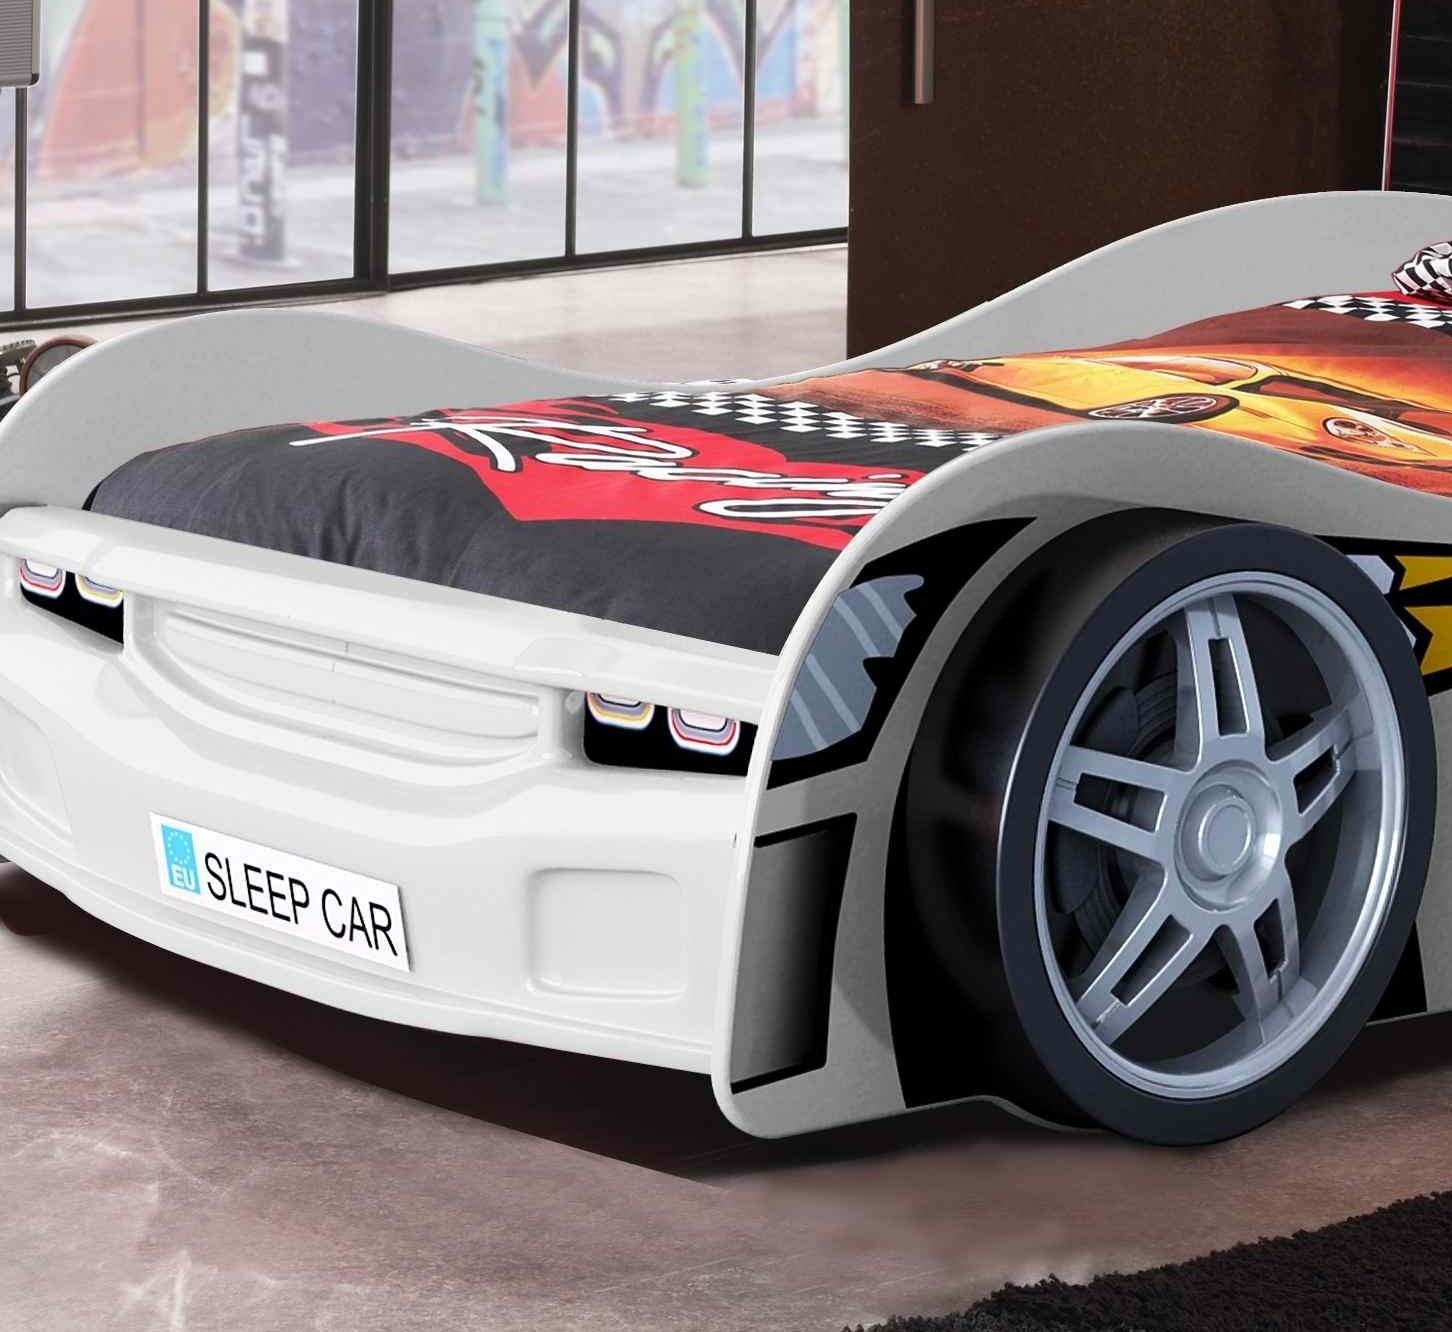 neu kinderbett night racer autobett rennautobett mit lattenrost 90 x 200 weiss ebay. Black Bedroom Furniture Sets. Home Design Ideas